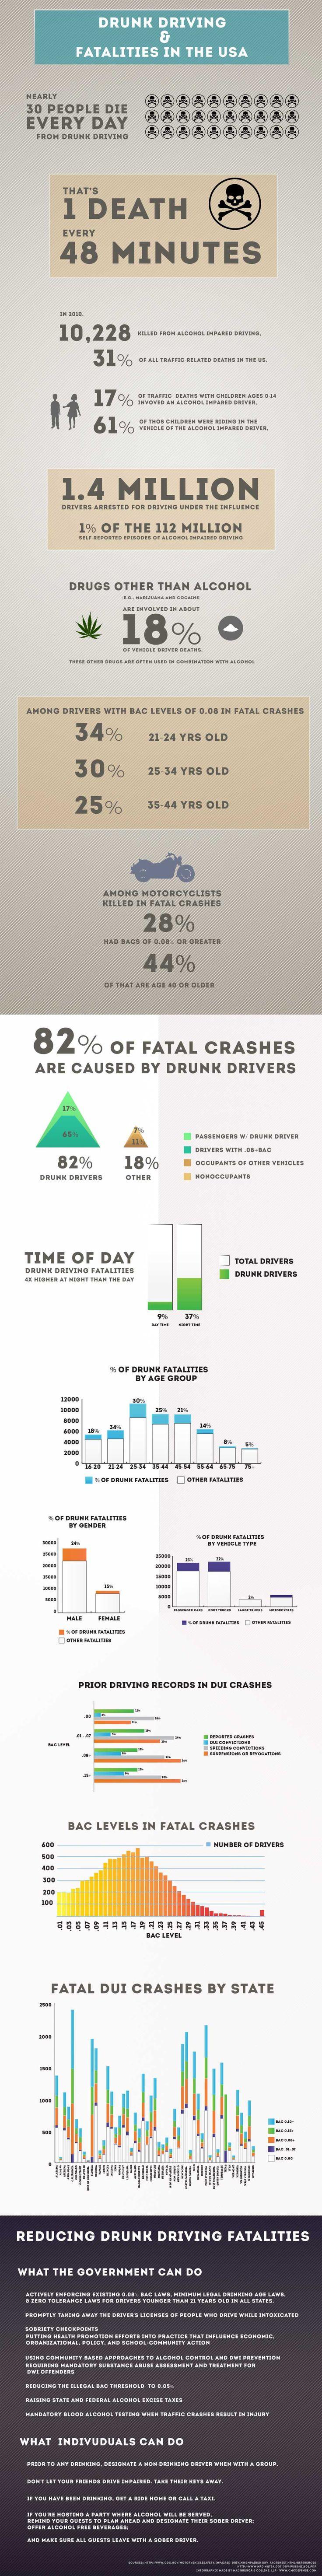 United States Drunk Driving Statistics [Infographic]